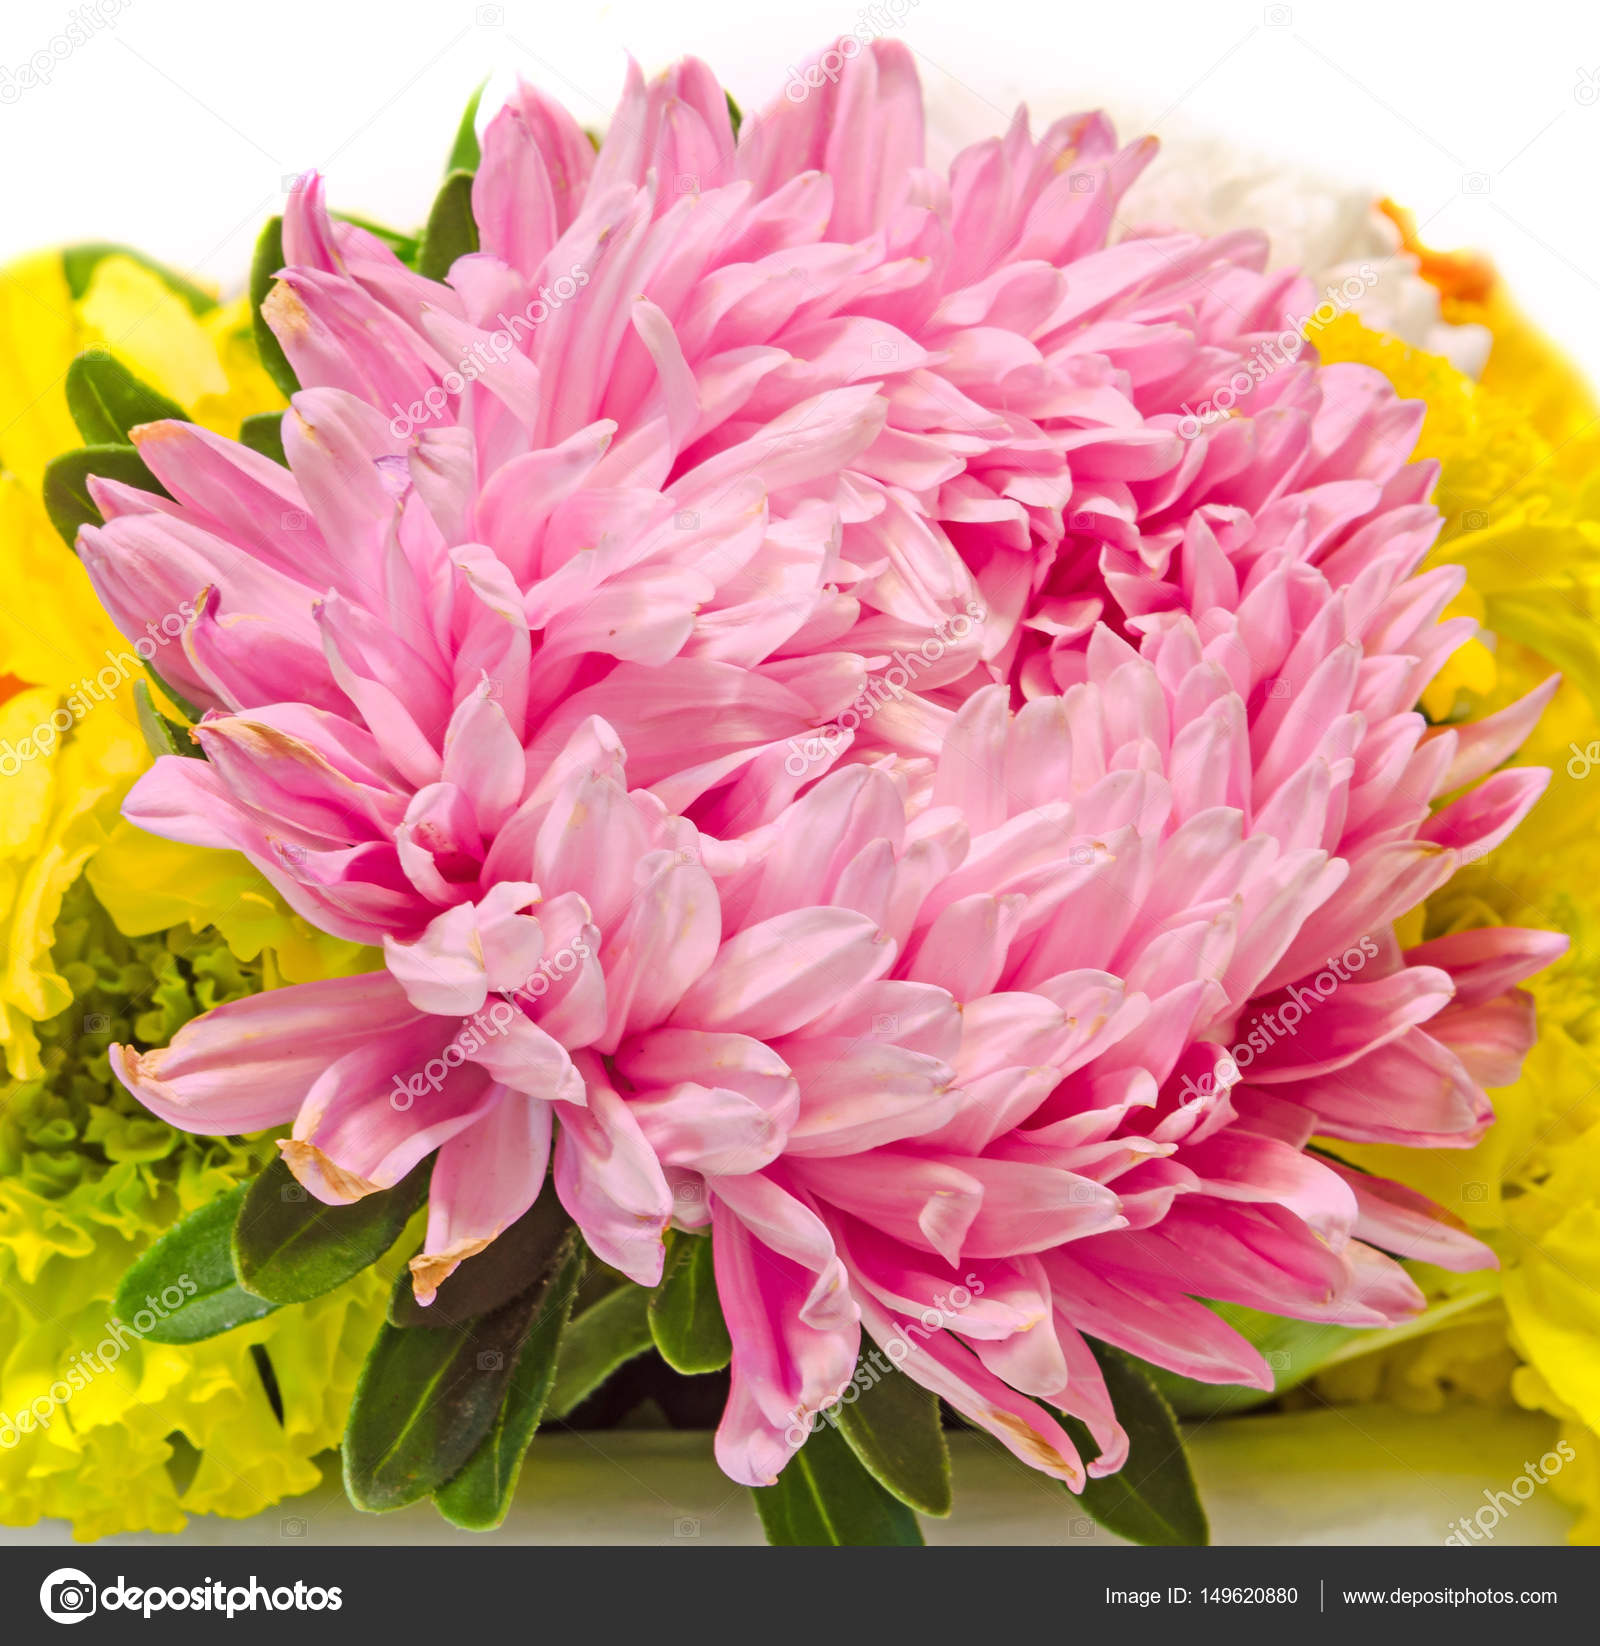 Pink purple colored chrysanthemum flowers bouquet close up pink purple colored chrysanthemum flowers bouquet close up stock photo izmirmasajfo